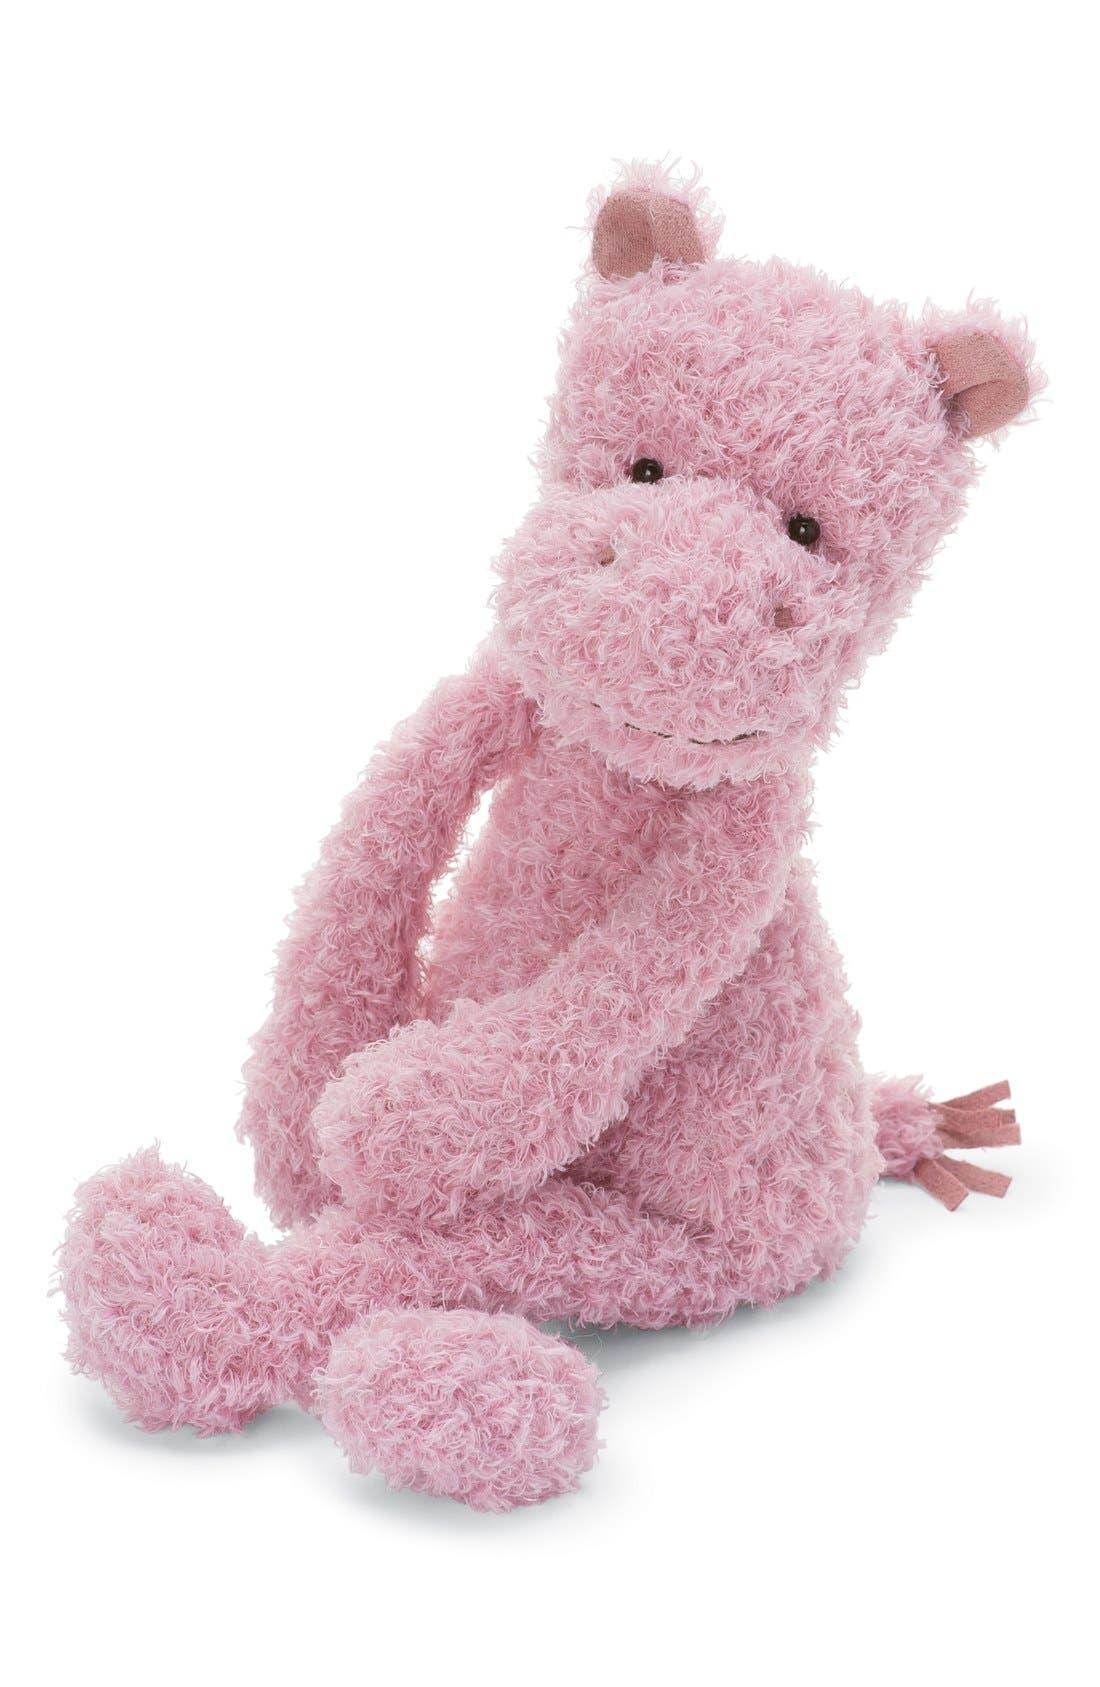 'Wild Thing Hippo' Stuffed Animal,                             Main thumbnail 1, color,